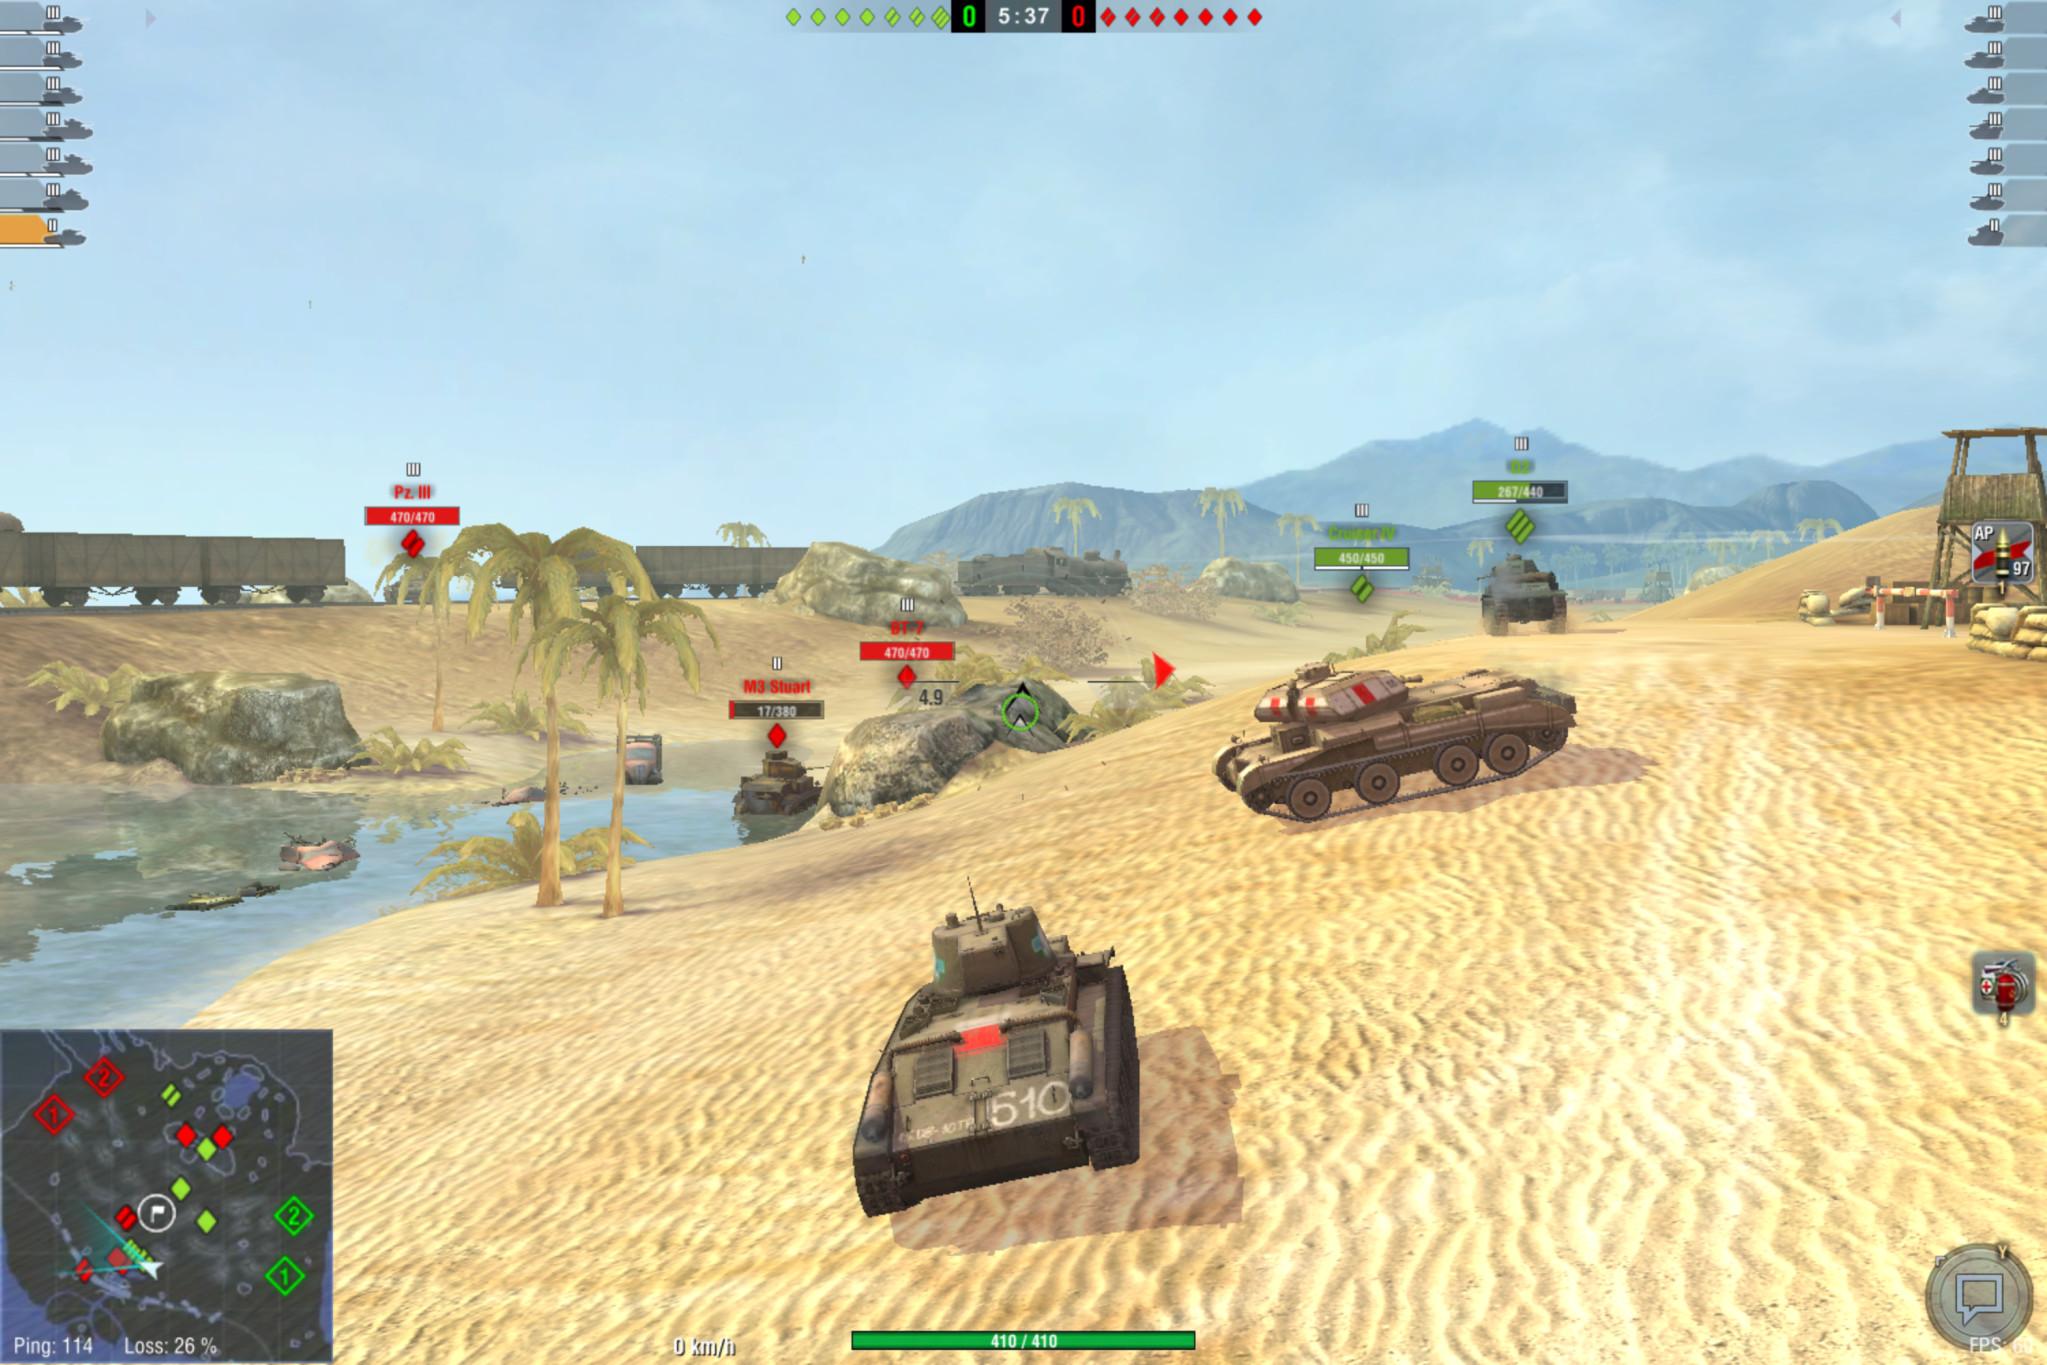 Screenshot 1 - World of Tanks Blitz